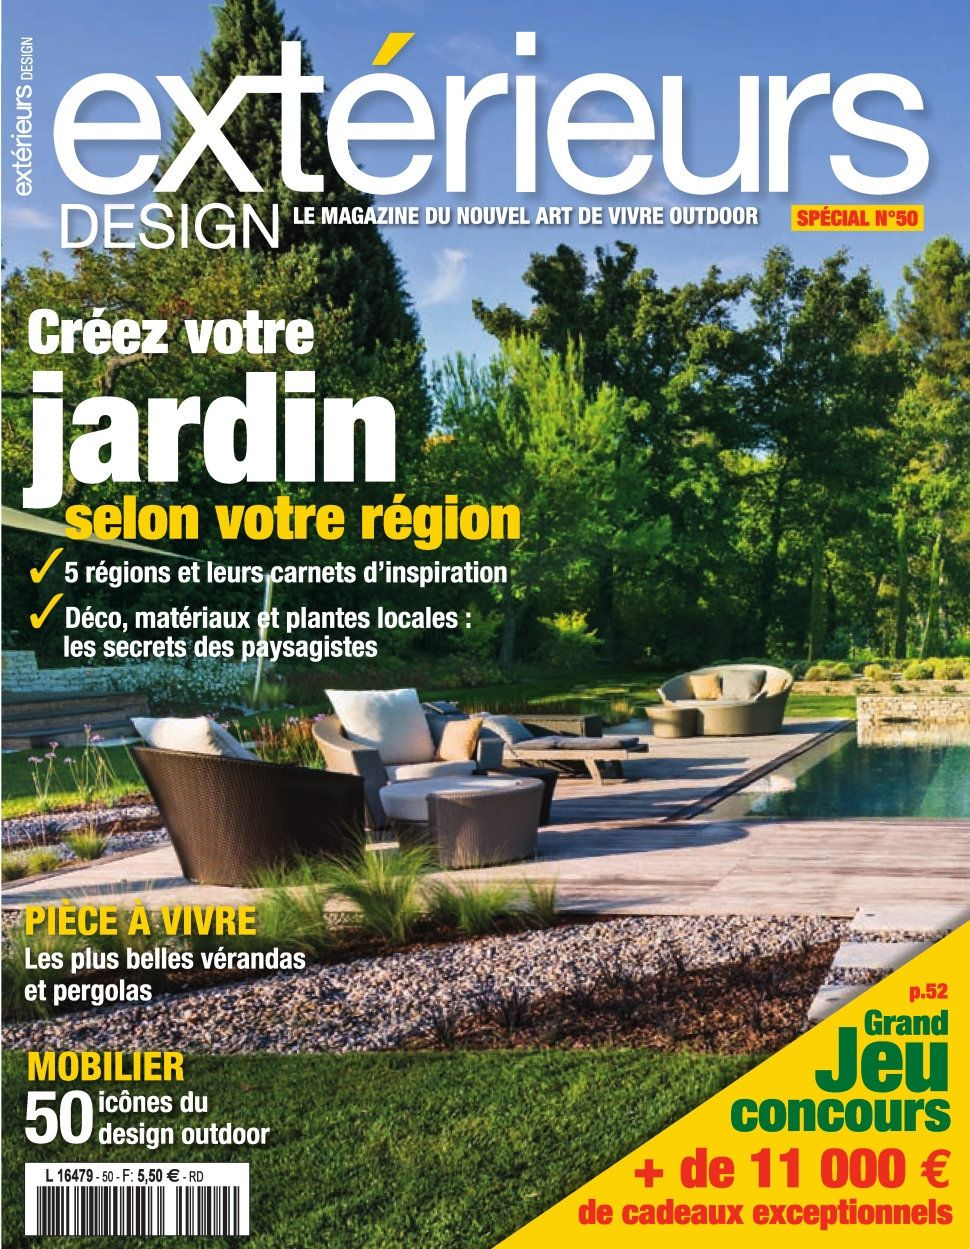 Exterieurs Design 50 - Mars/Avril 2016